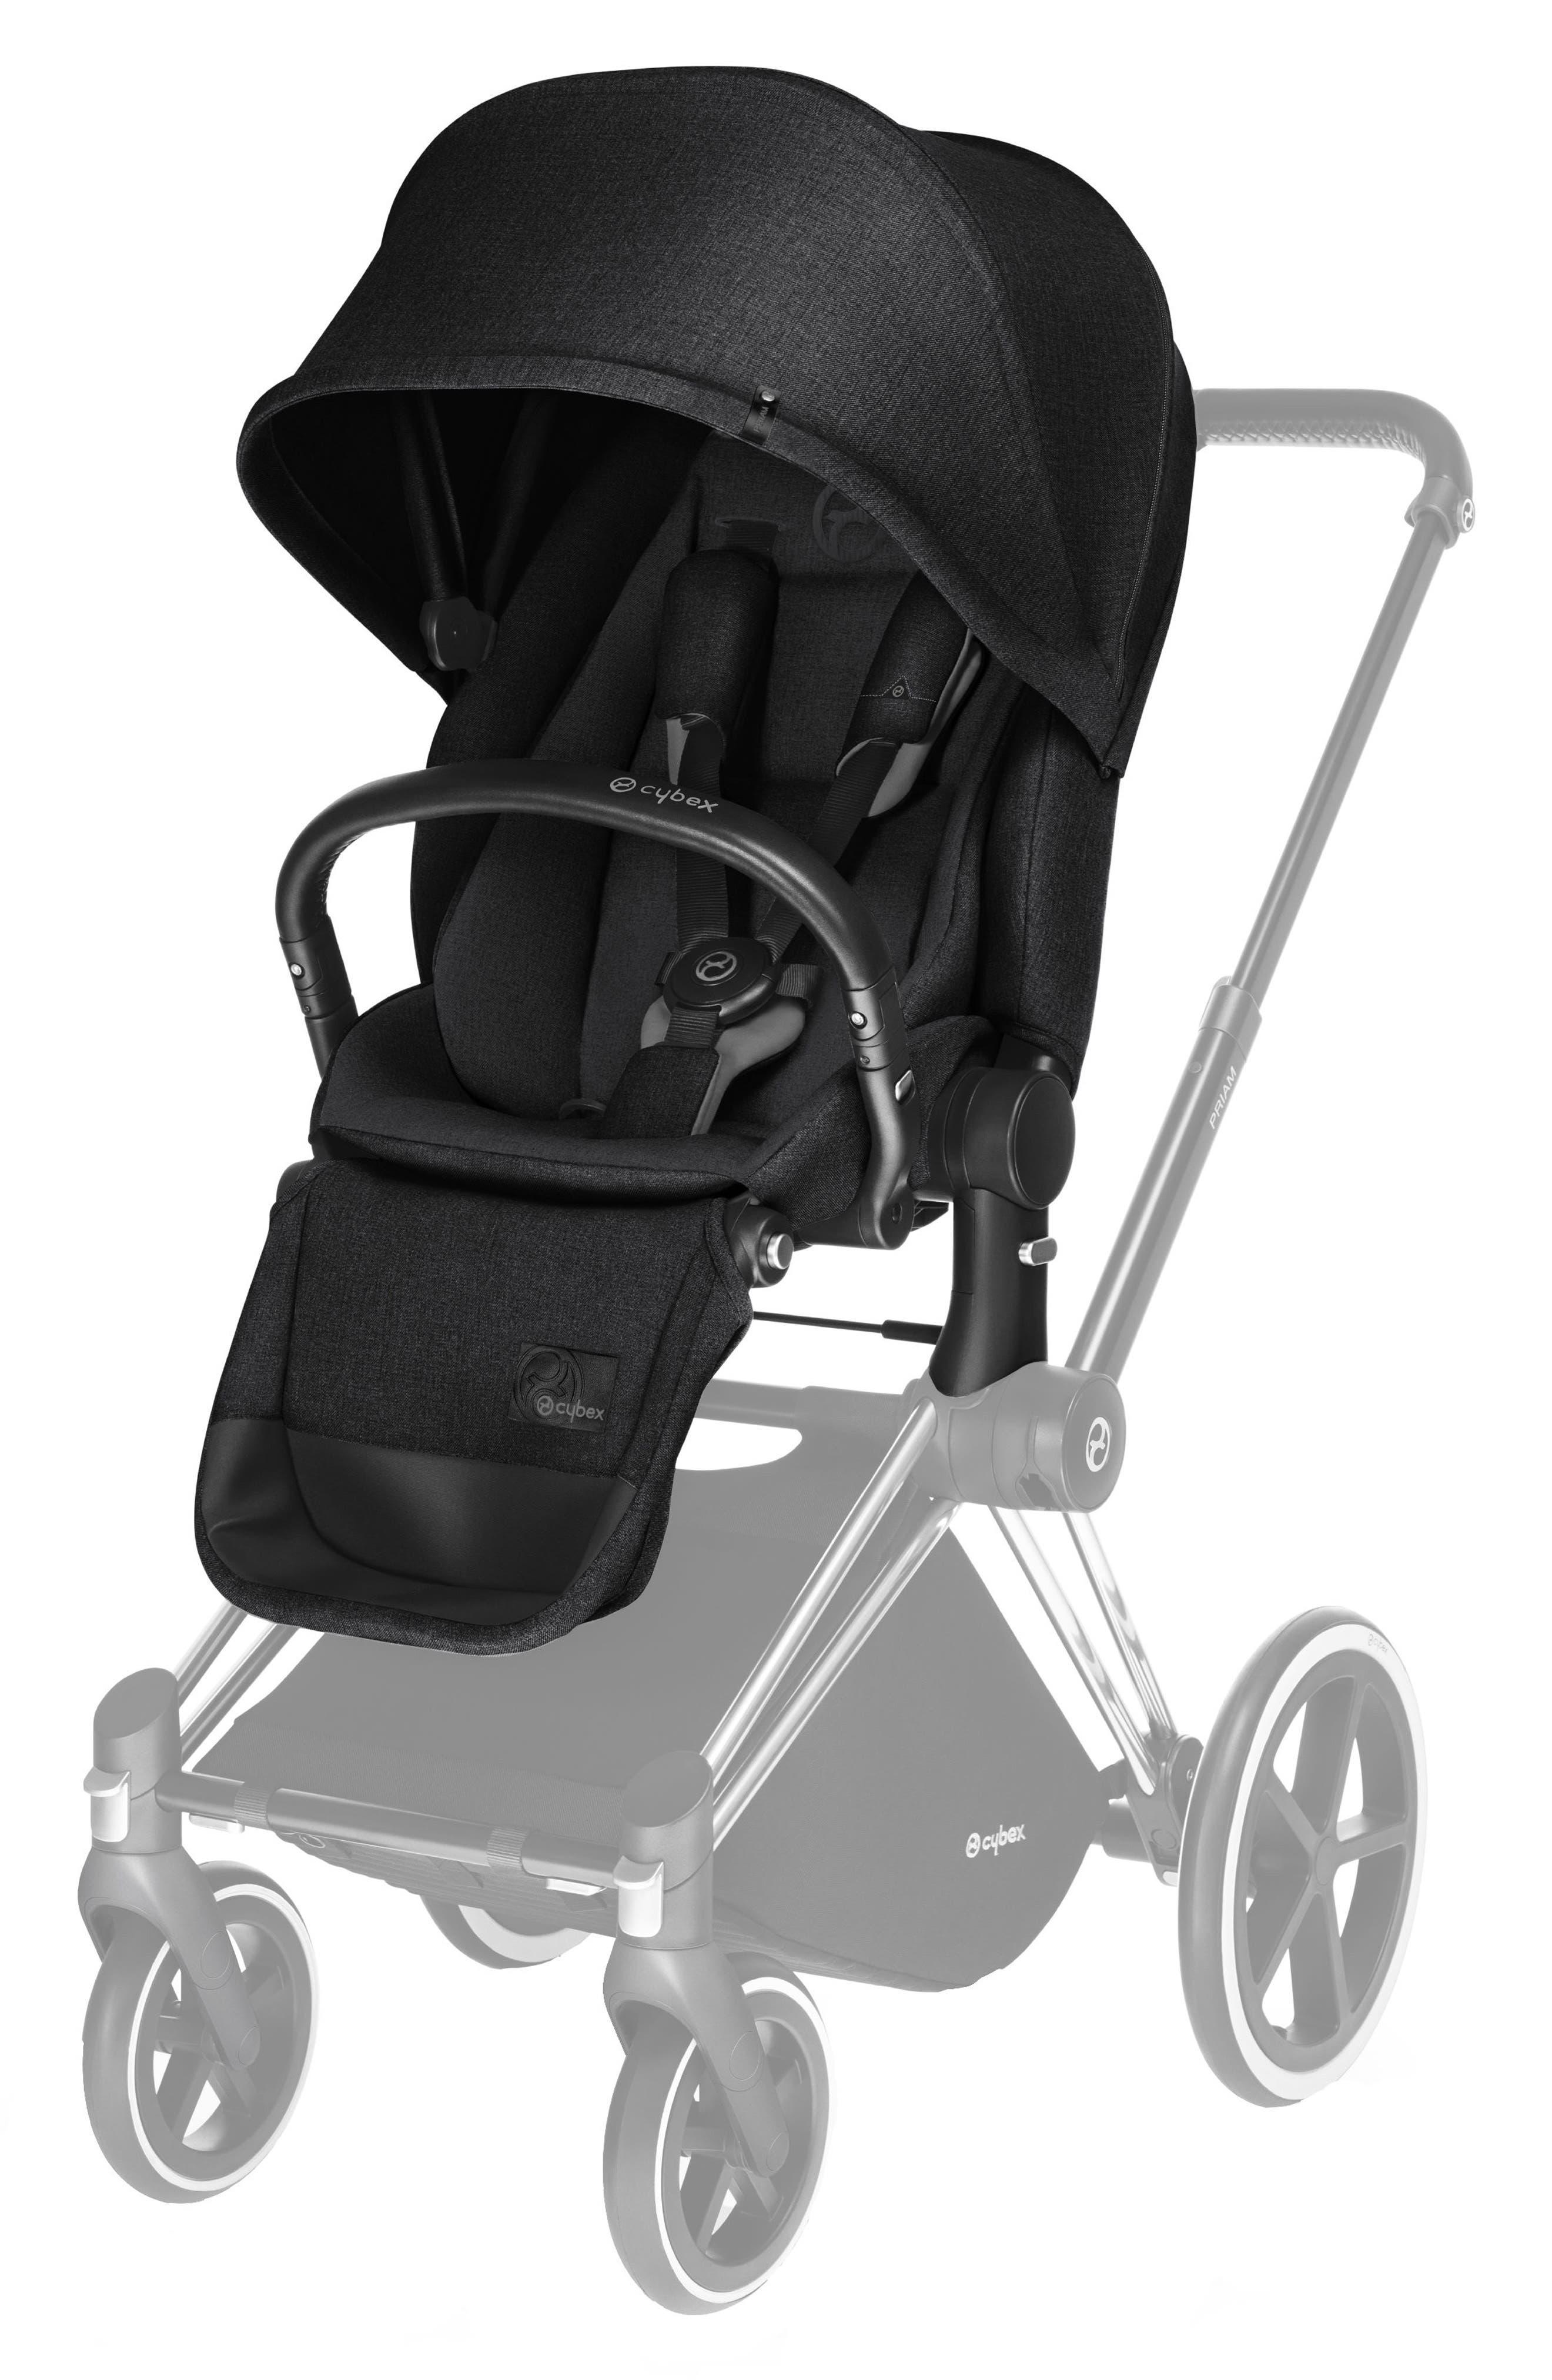 Main Image - CYBEX Priam Lux Seat for Priam Modular Stroller